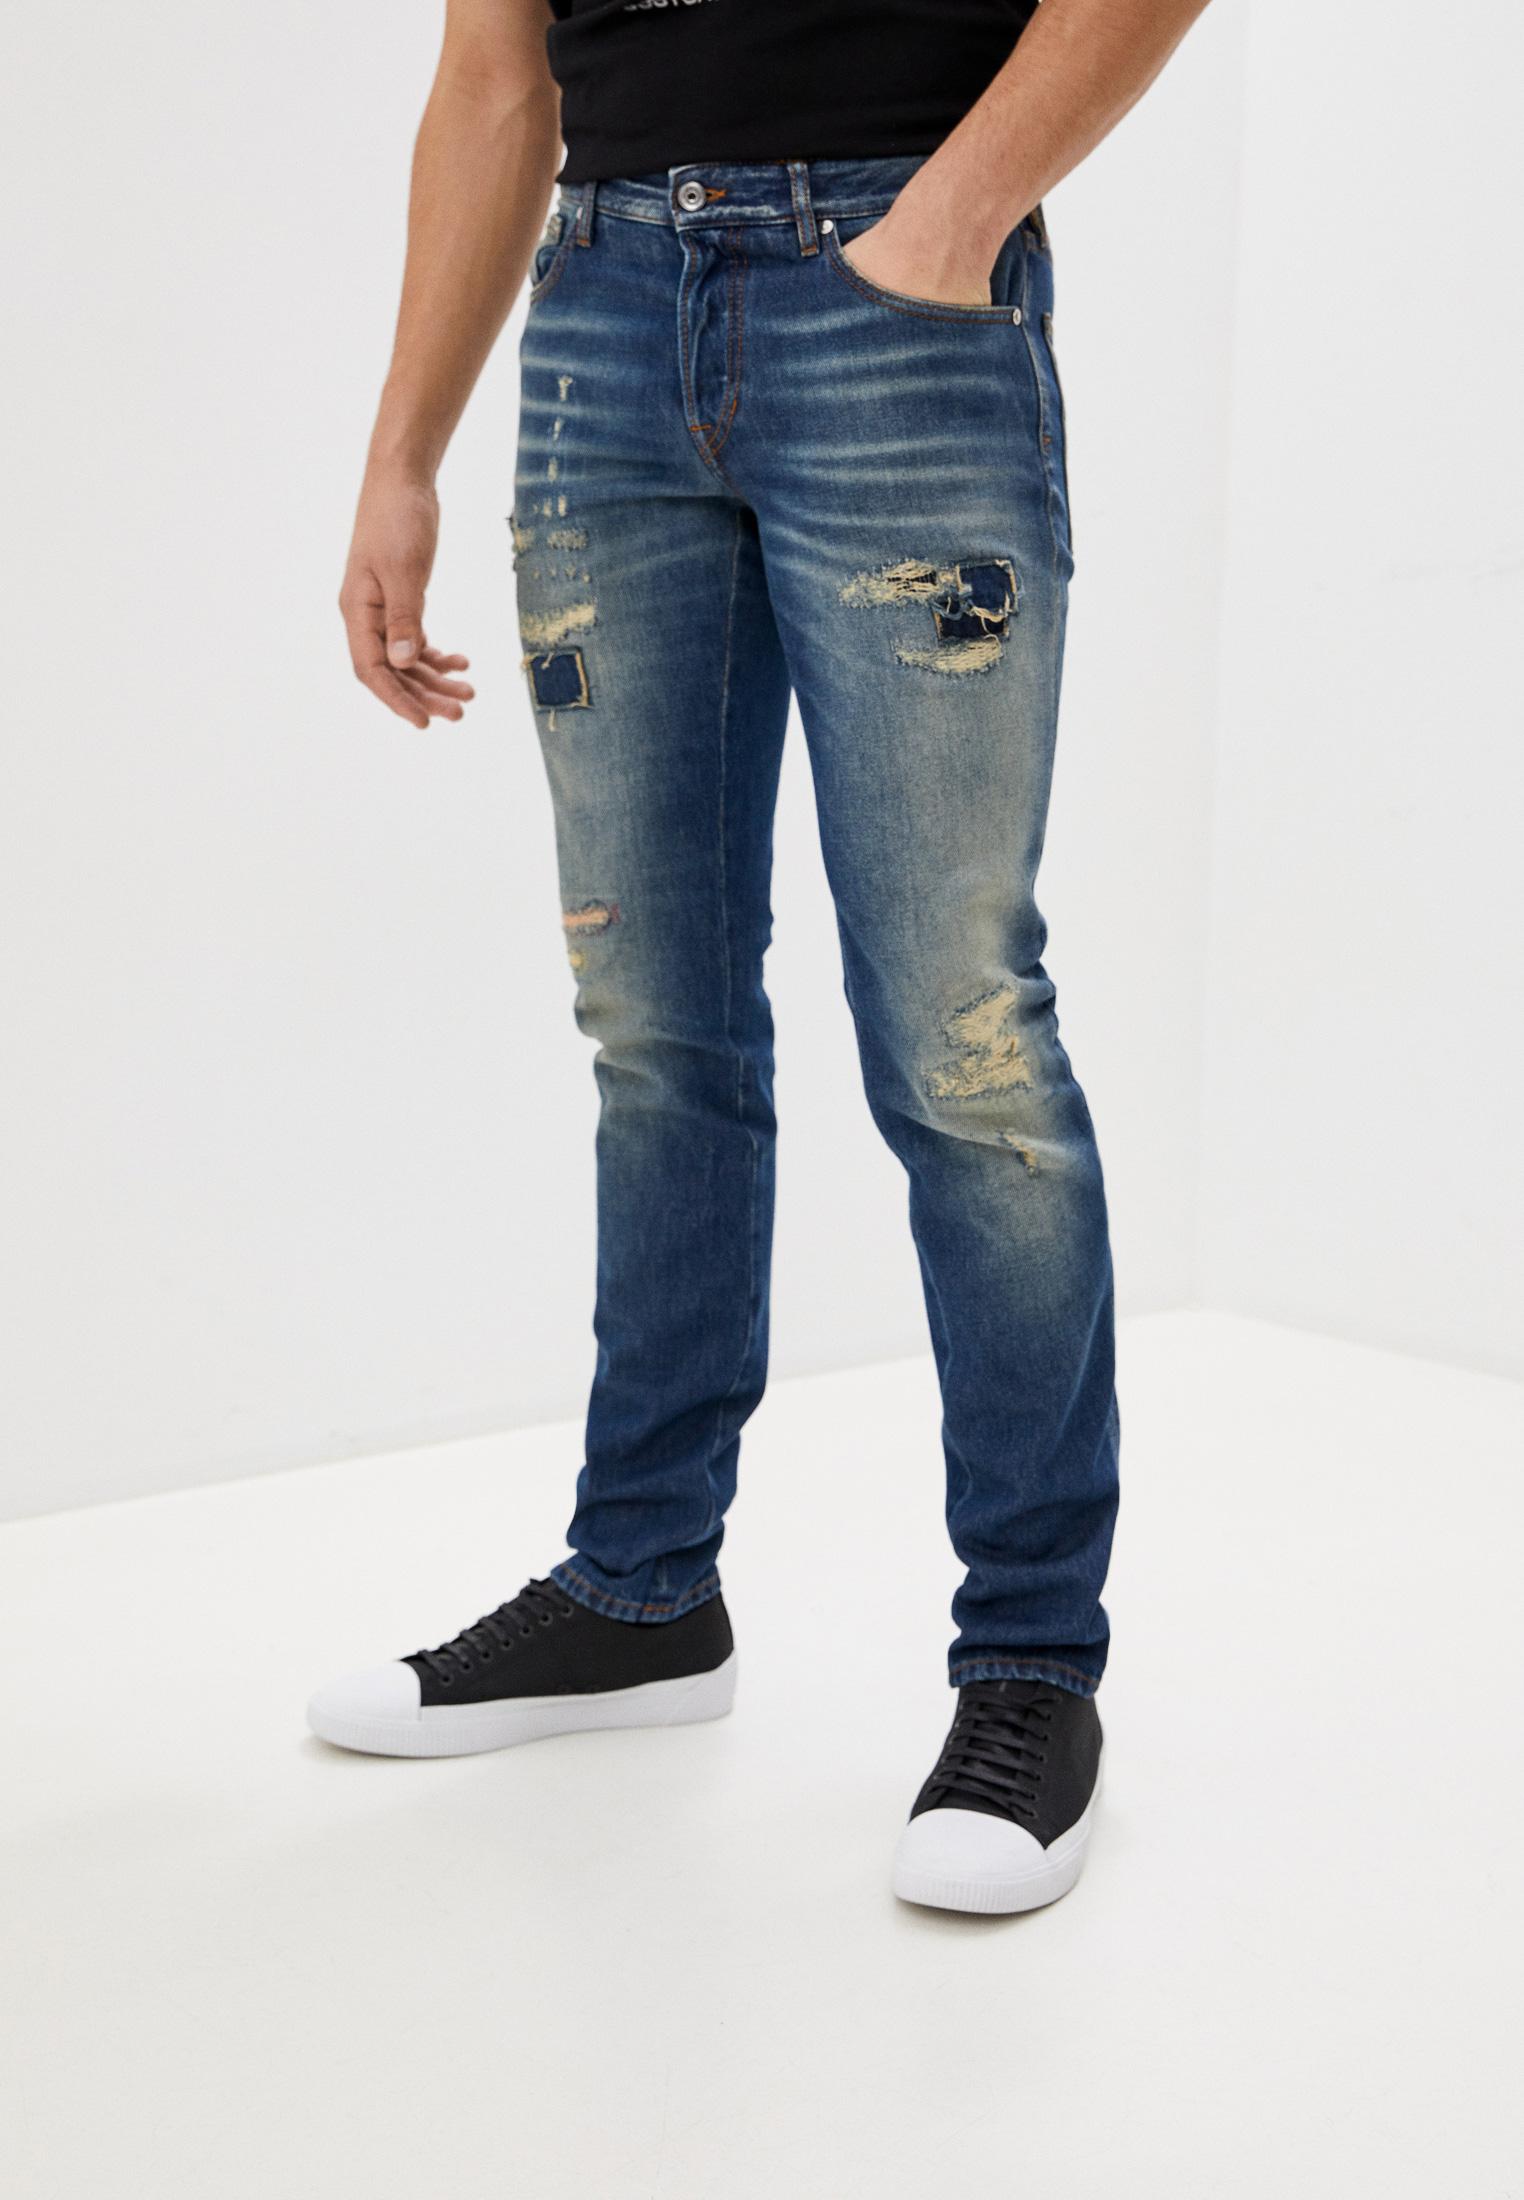 Зауженные джинсы Just Cavalli (Джаст Кавалли) s01la0124n31816